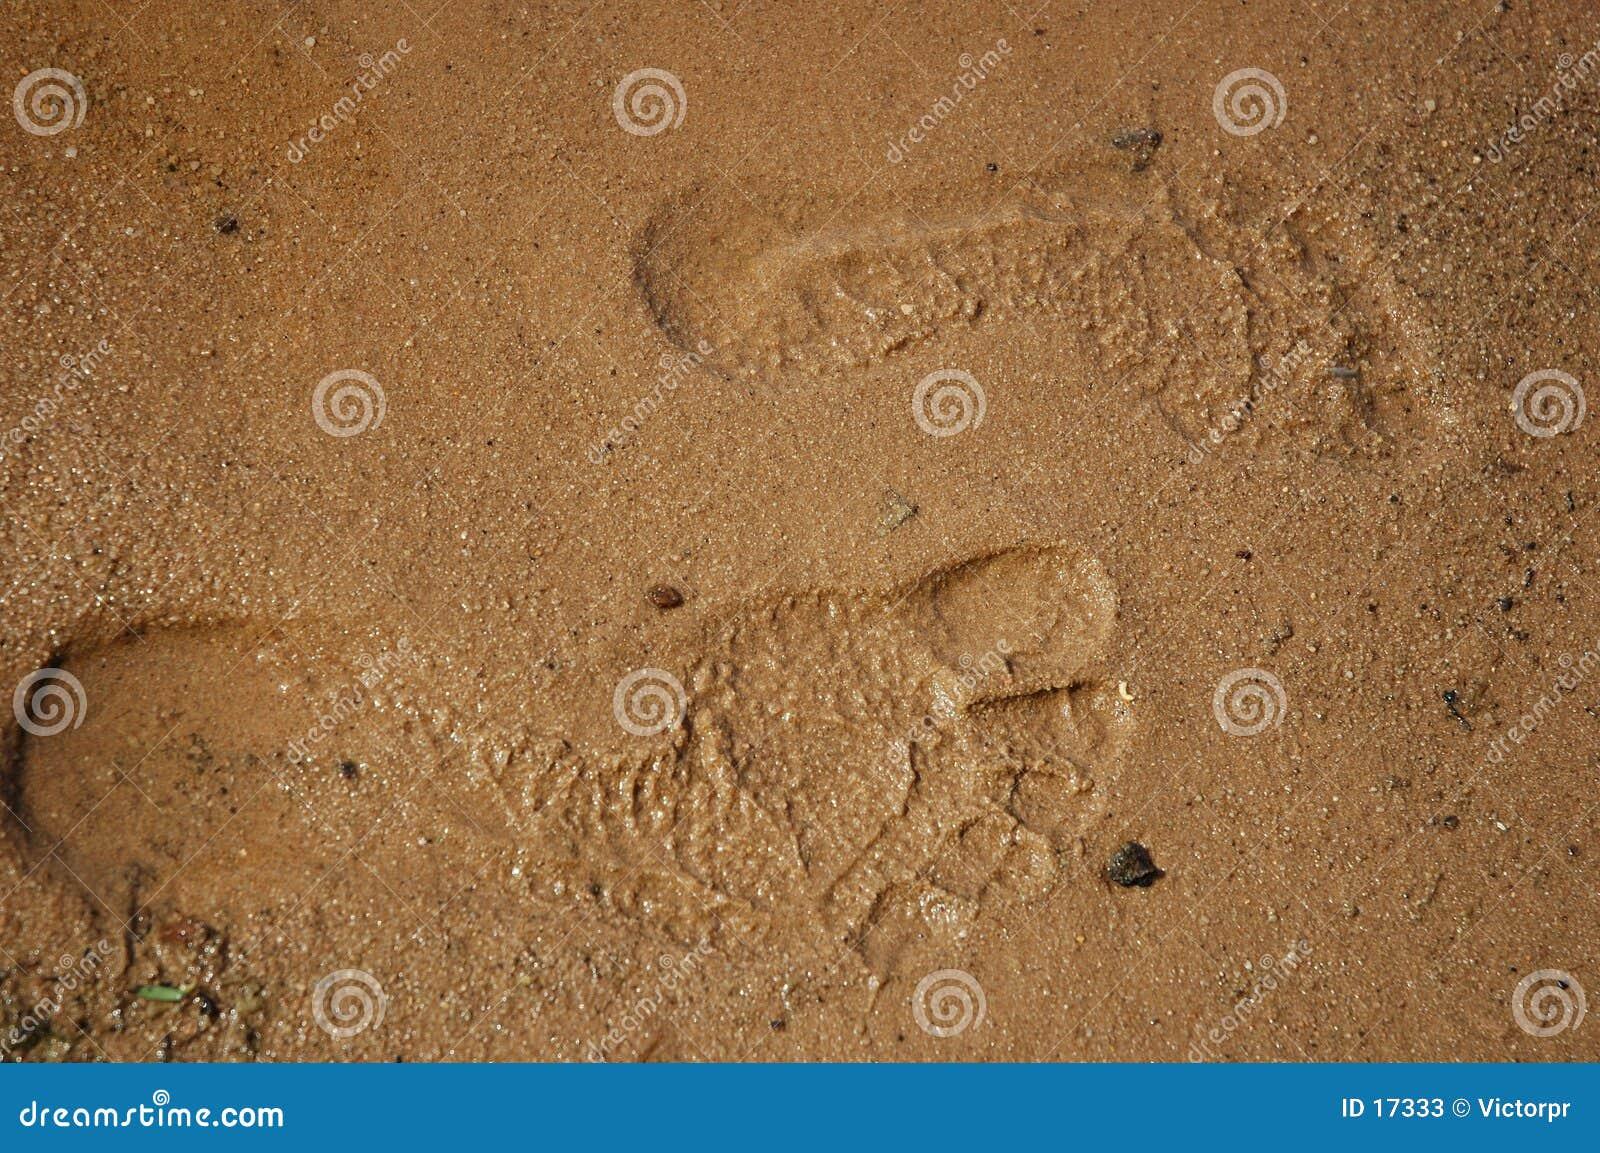 Feet steps